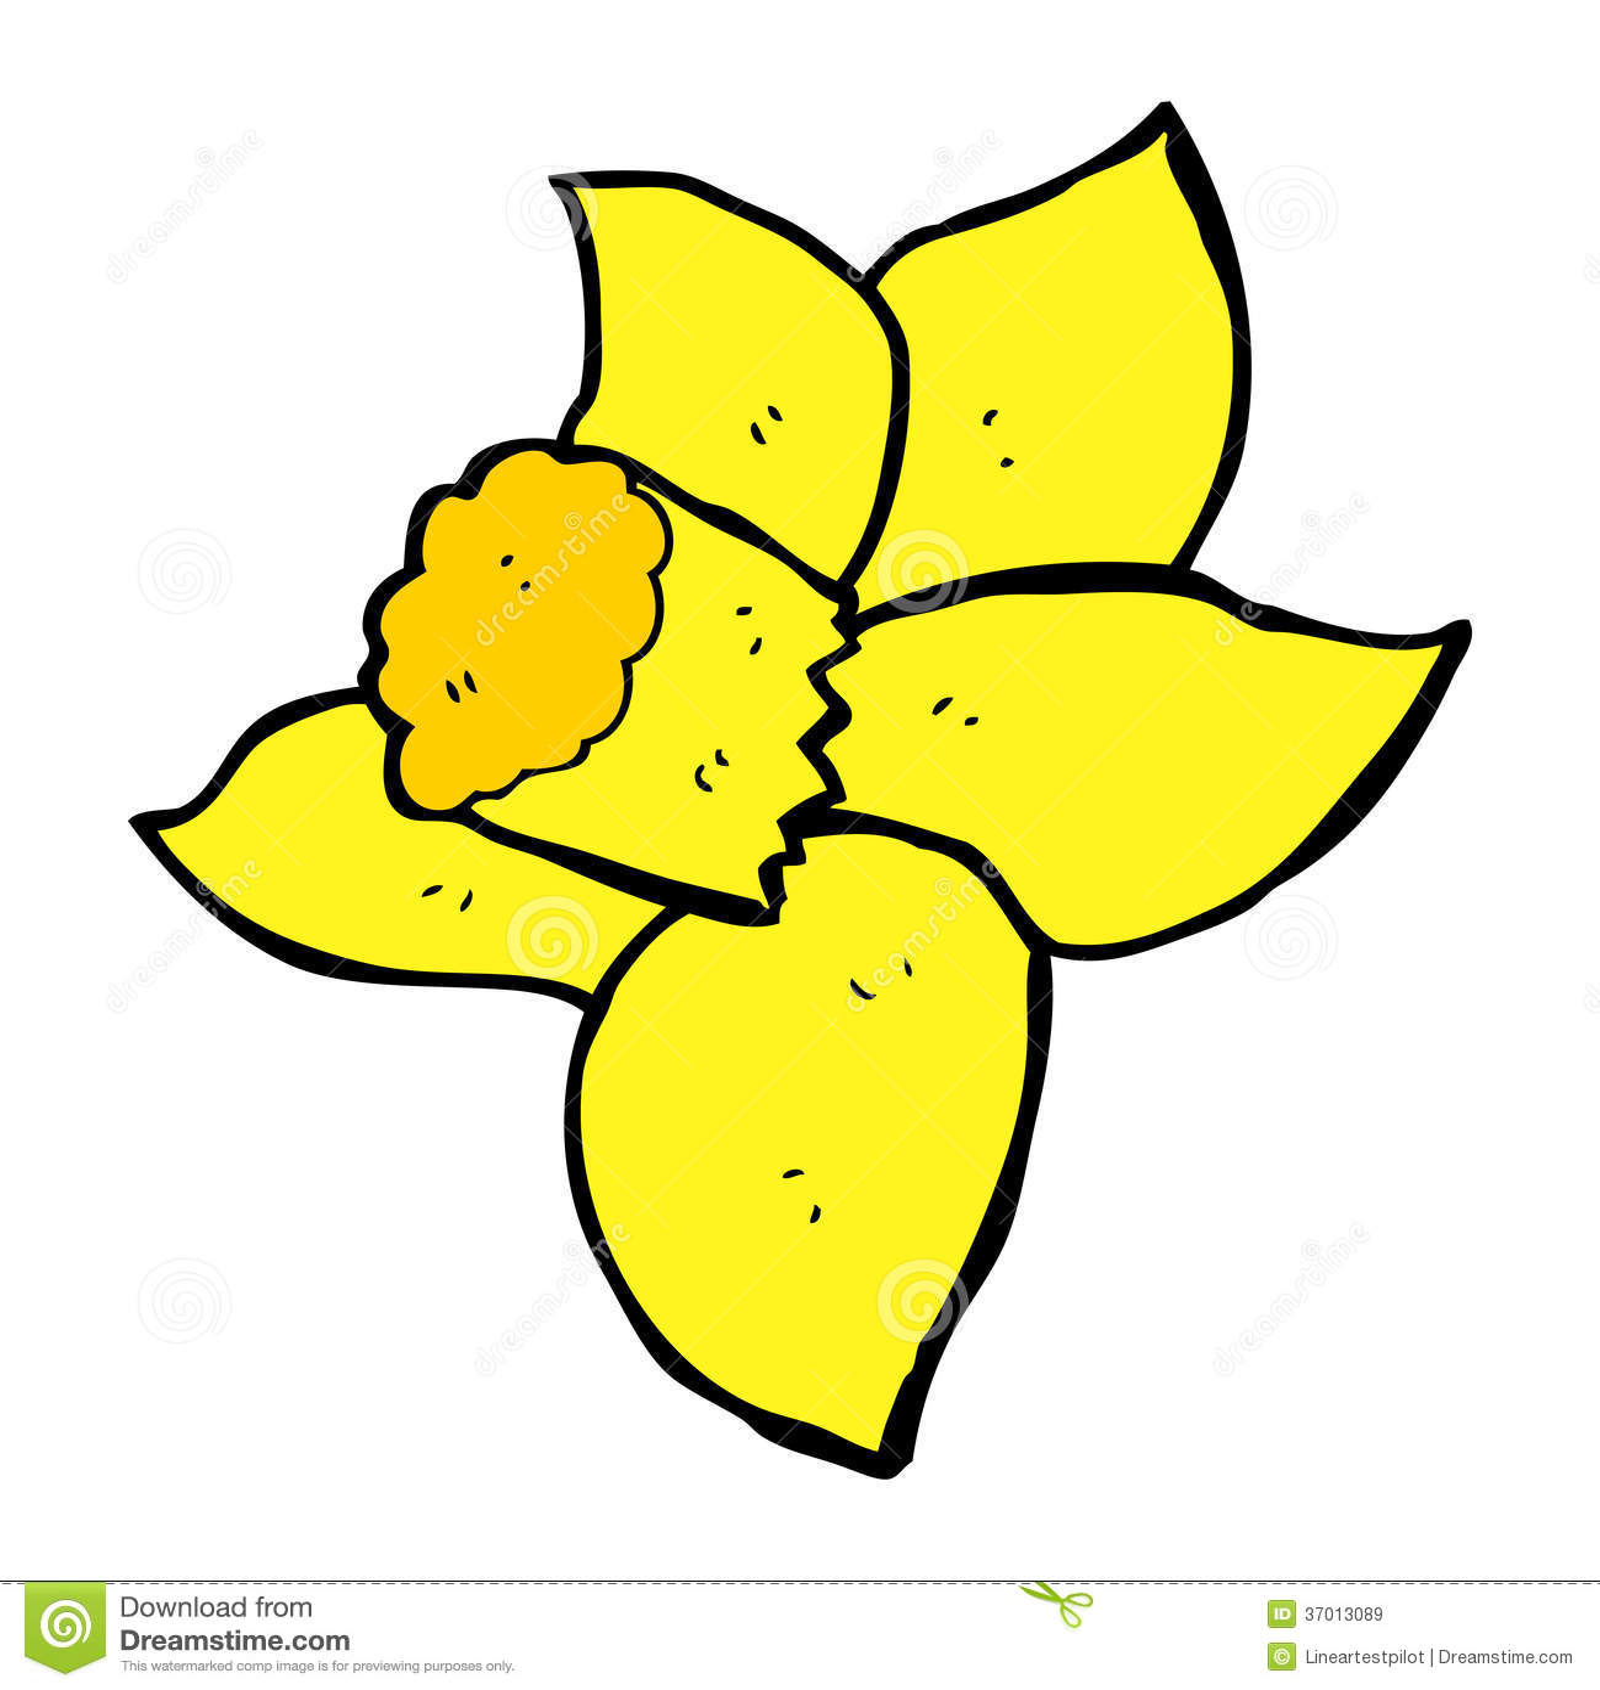 Cartoon daffodil stock vector. Illustration of retro ...